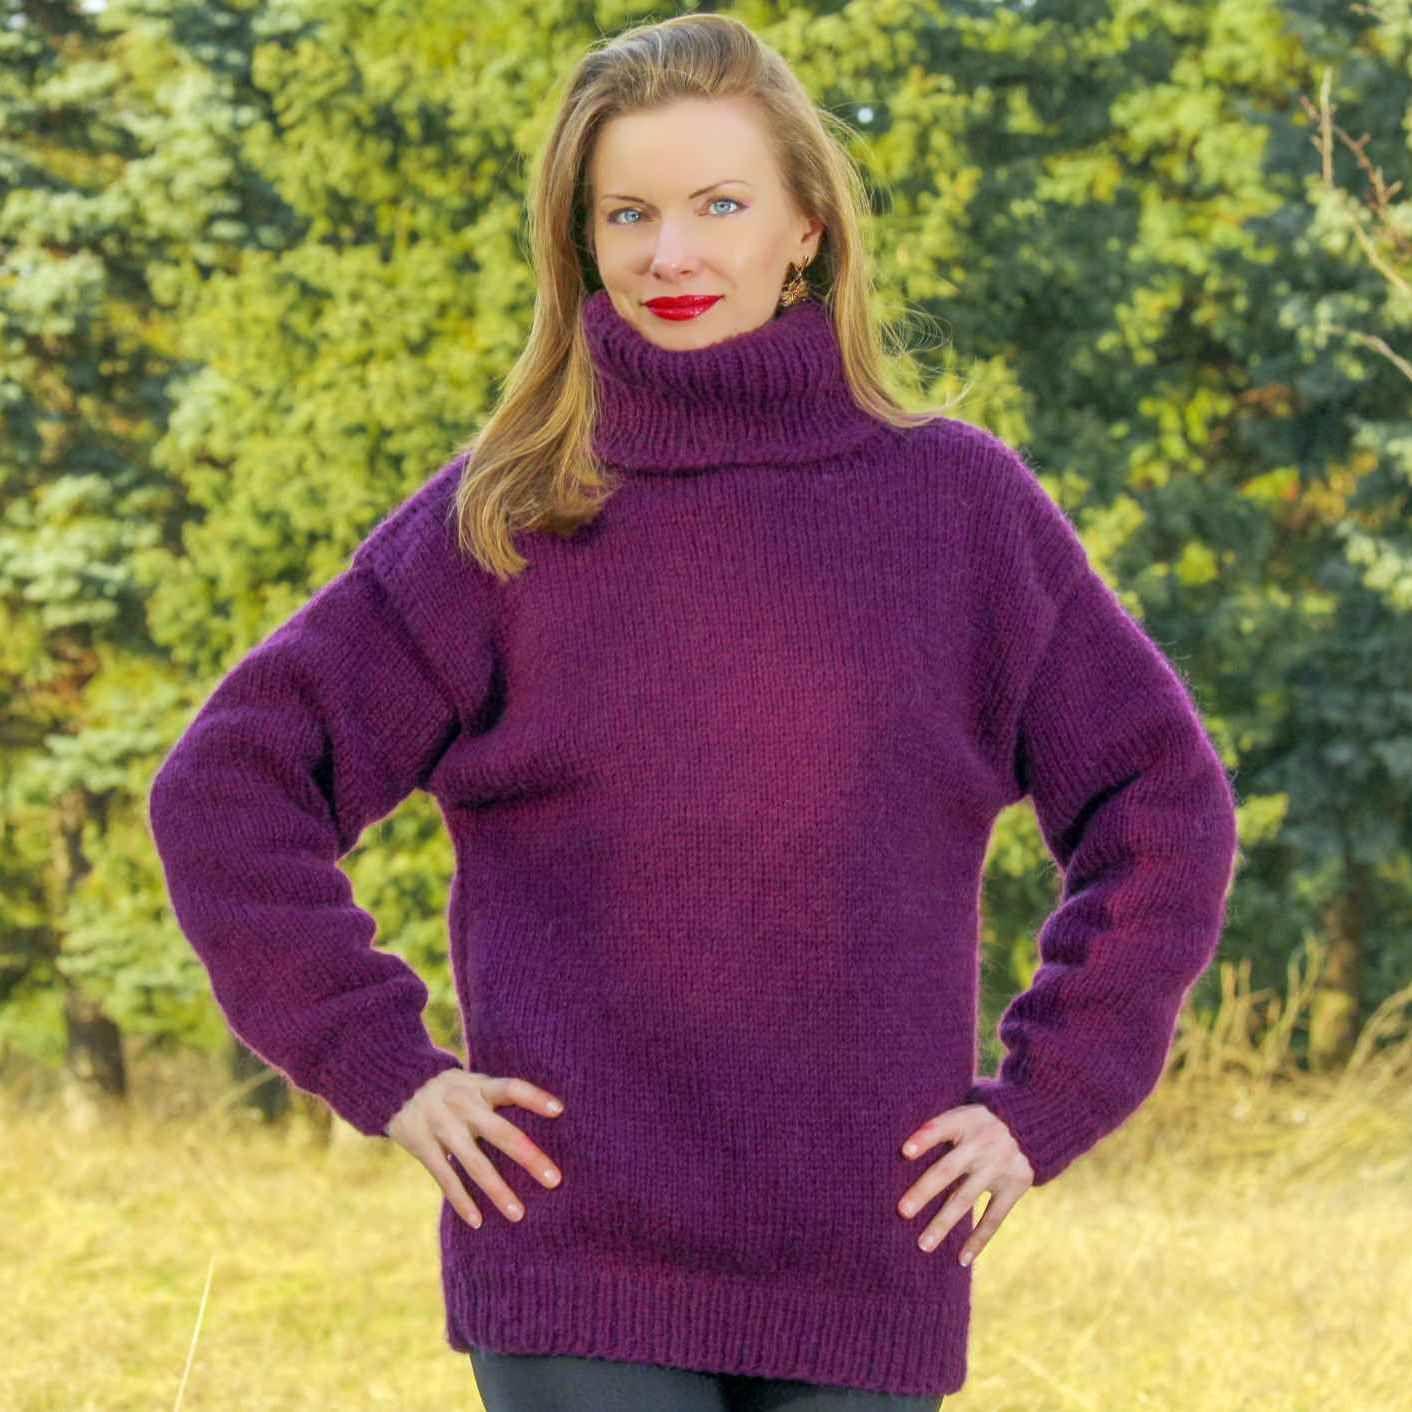 Eddie Bauer Purple Cable Knit Sweater size M Womens Cotton Blend V-Neck Soft #EddieBauer #VNeck